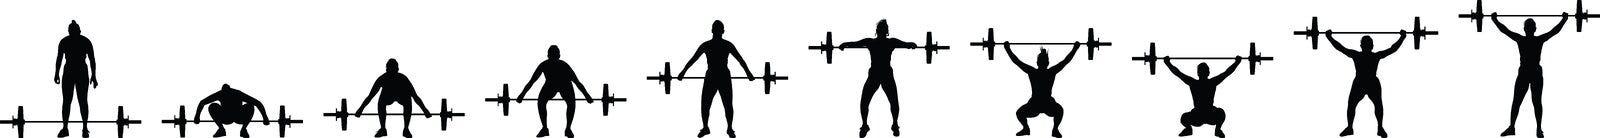 Gewichthebenmädchen stockbilder